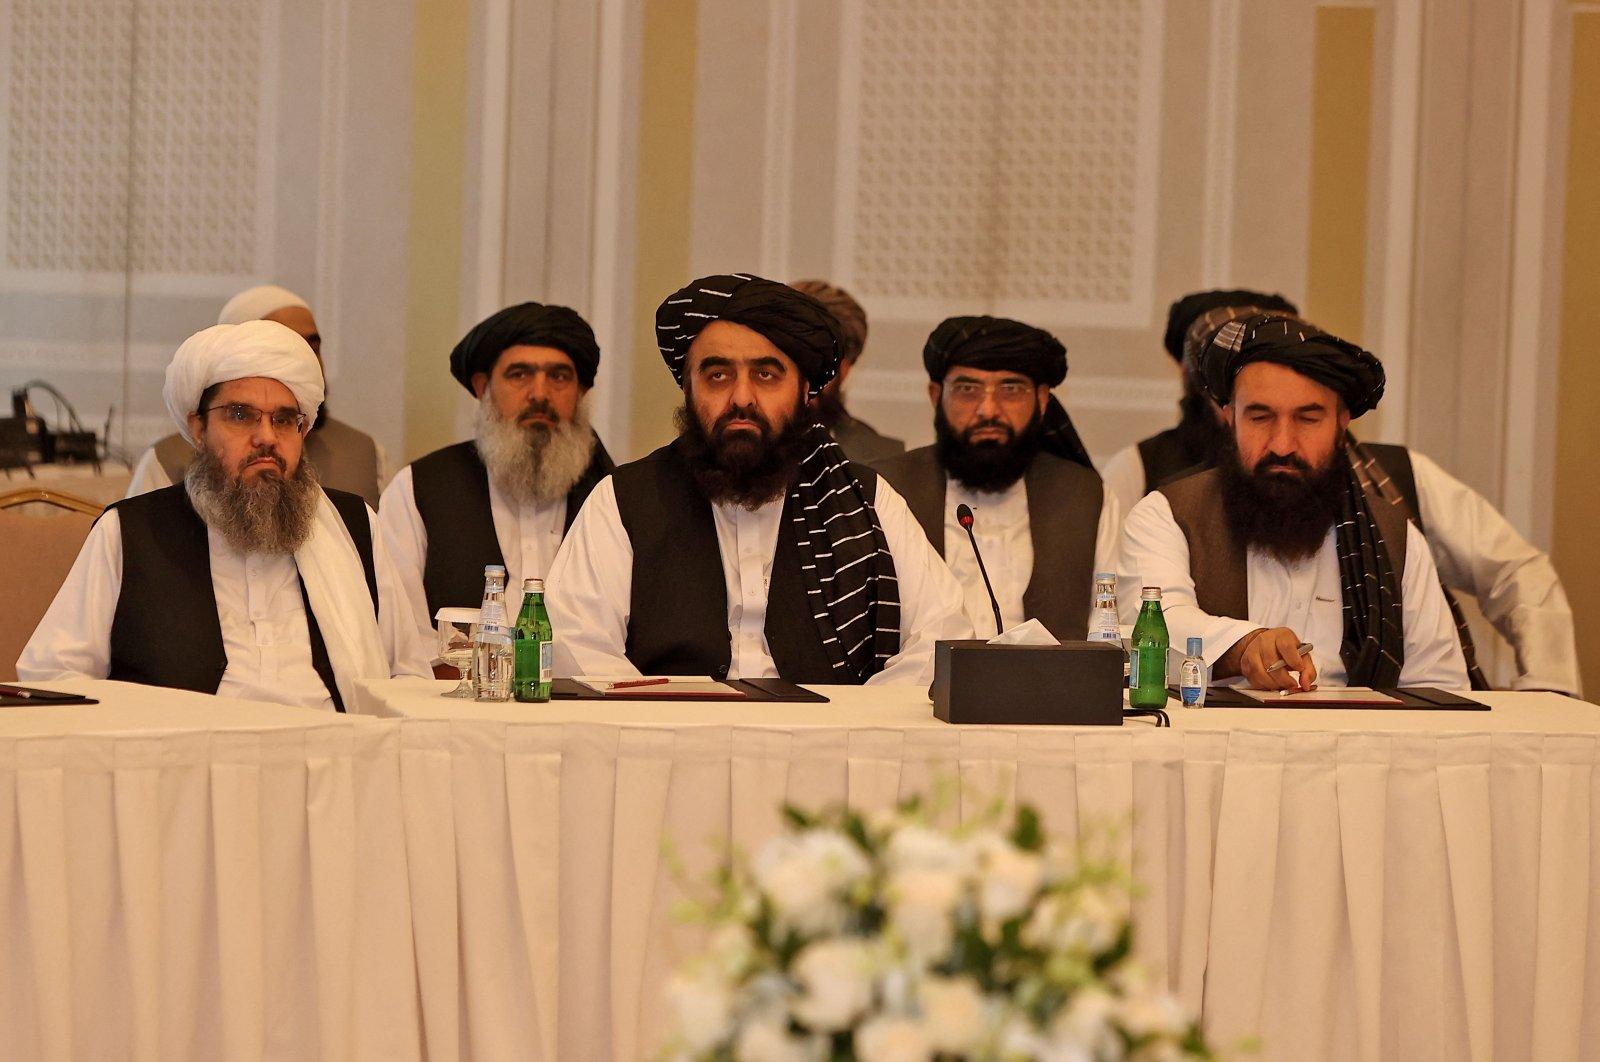 Members of the Taliban delegation Shahabuddin Delawar (L), Amir Khan Muttaqi, and Khairullah Khairkhwa (R) meet with foreign diplomats in Qatar's capital Doha, on Oct.12, 2021. (AFP Photo)